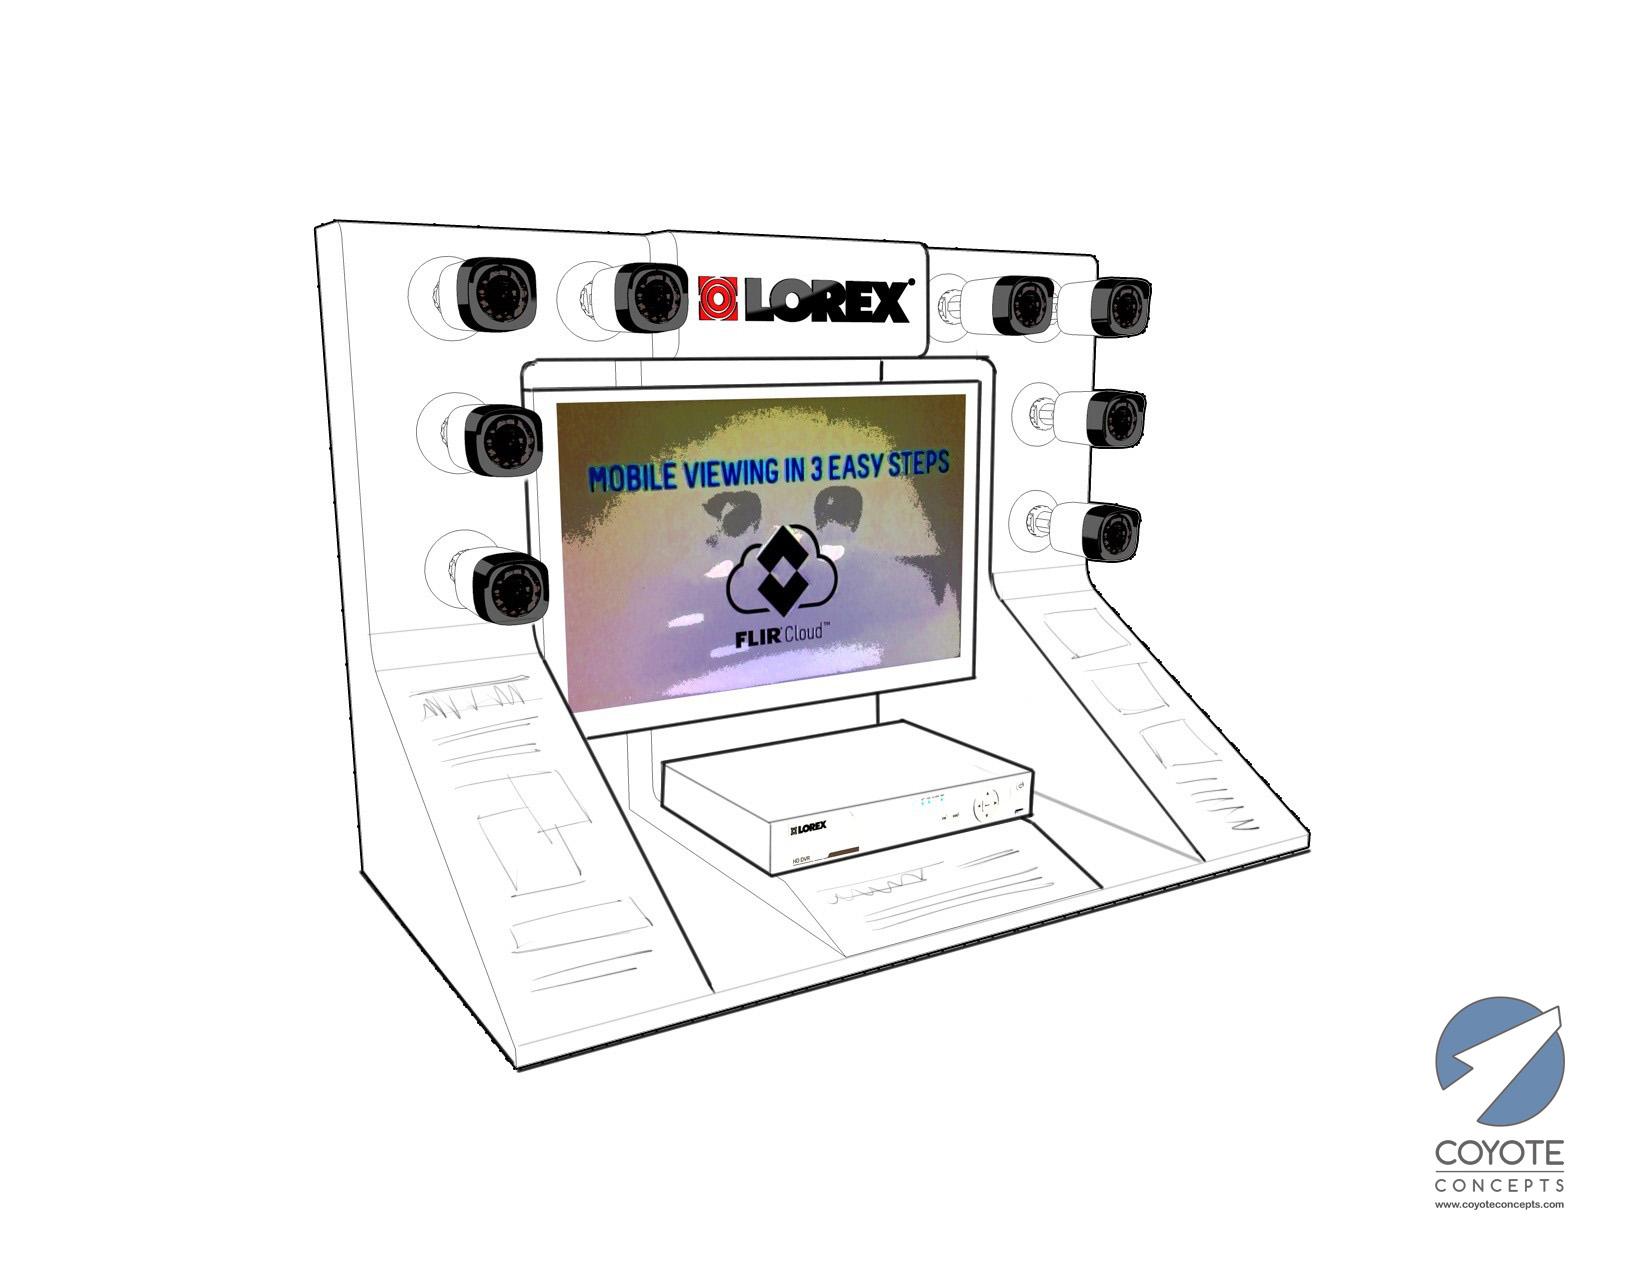 Lorex concept C.jpg